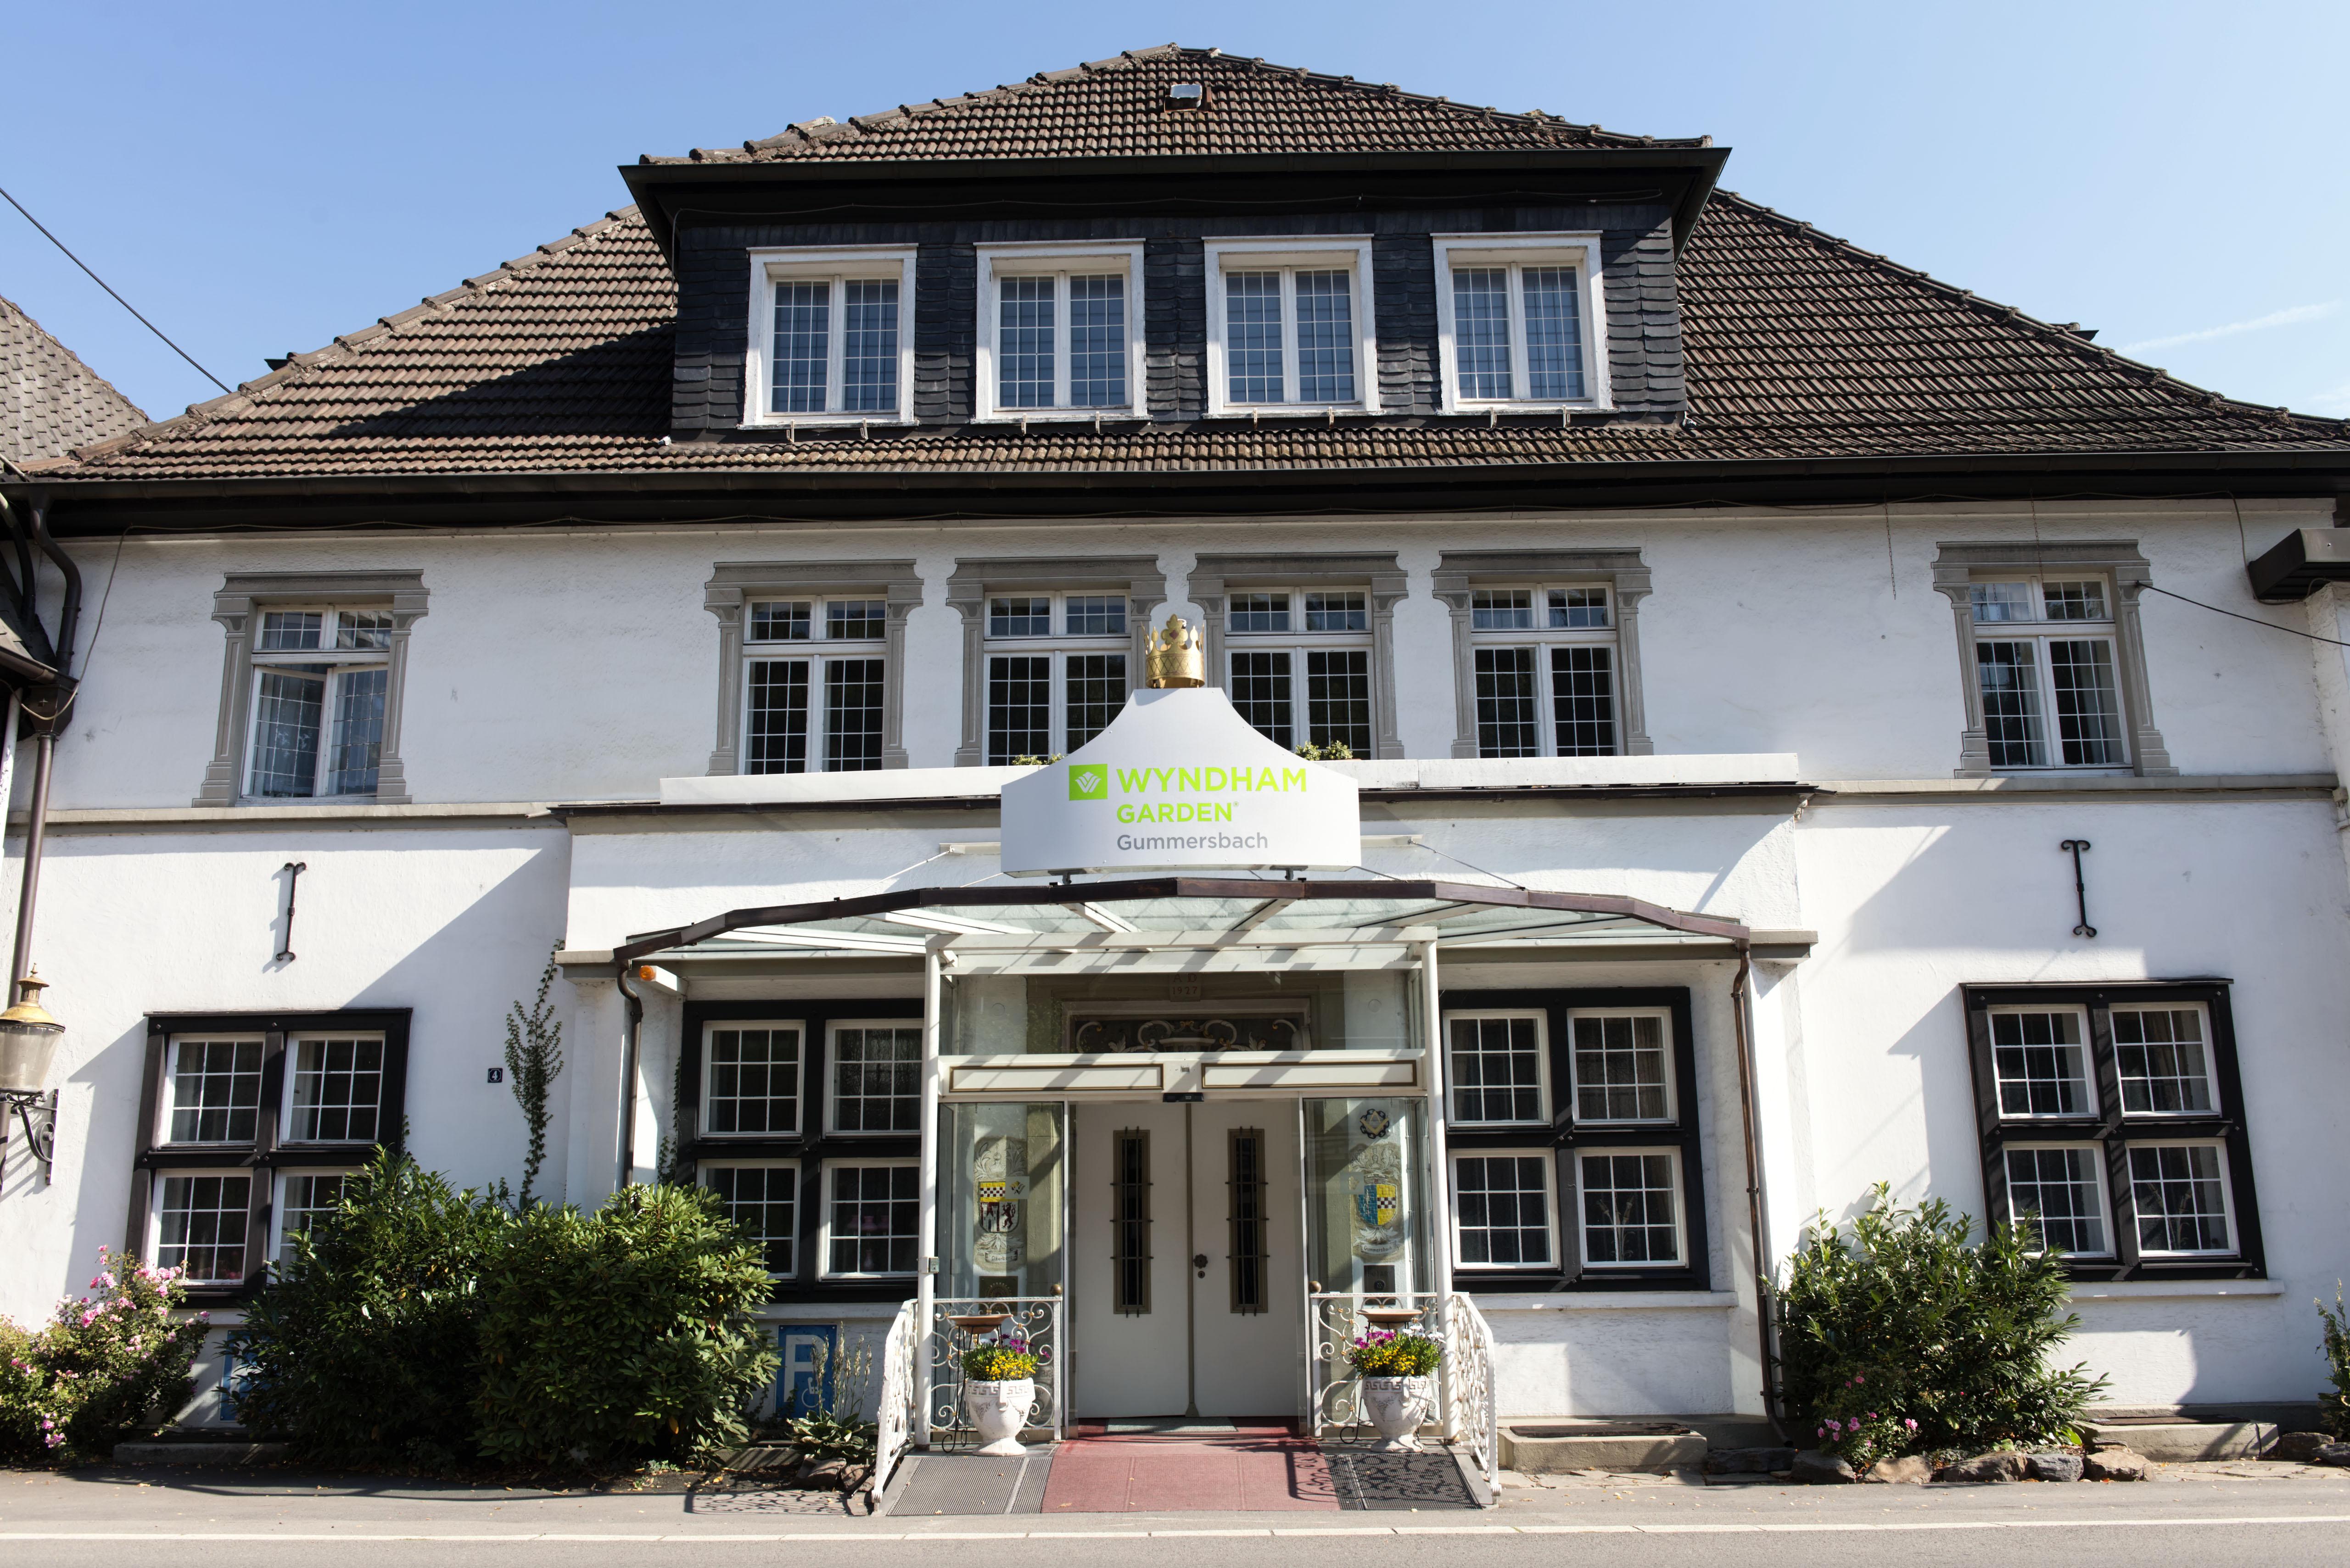 4* Wyndham Garden Gummersbach Hotel: EarthCheck Level 4